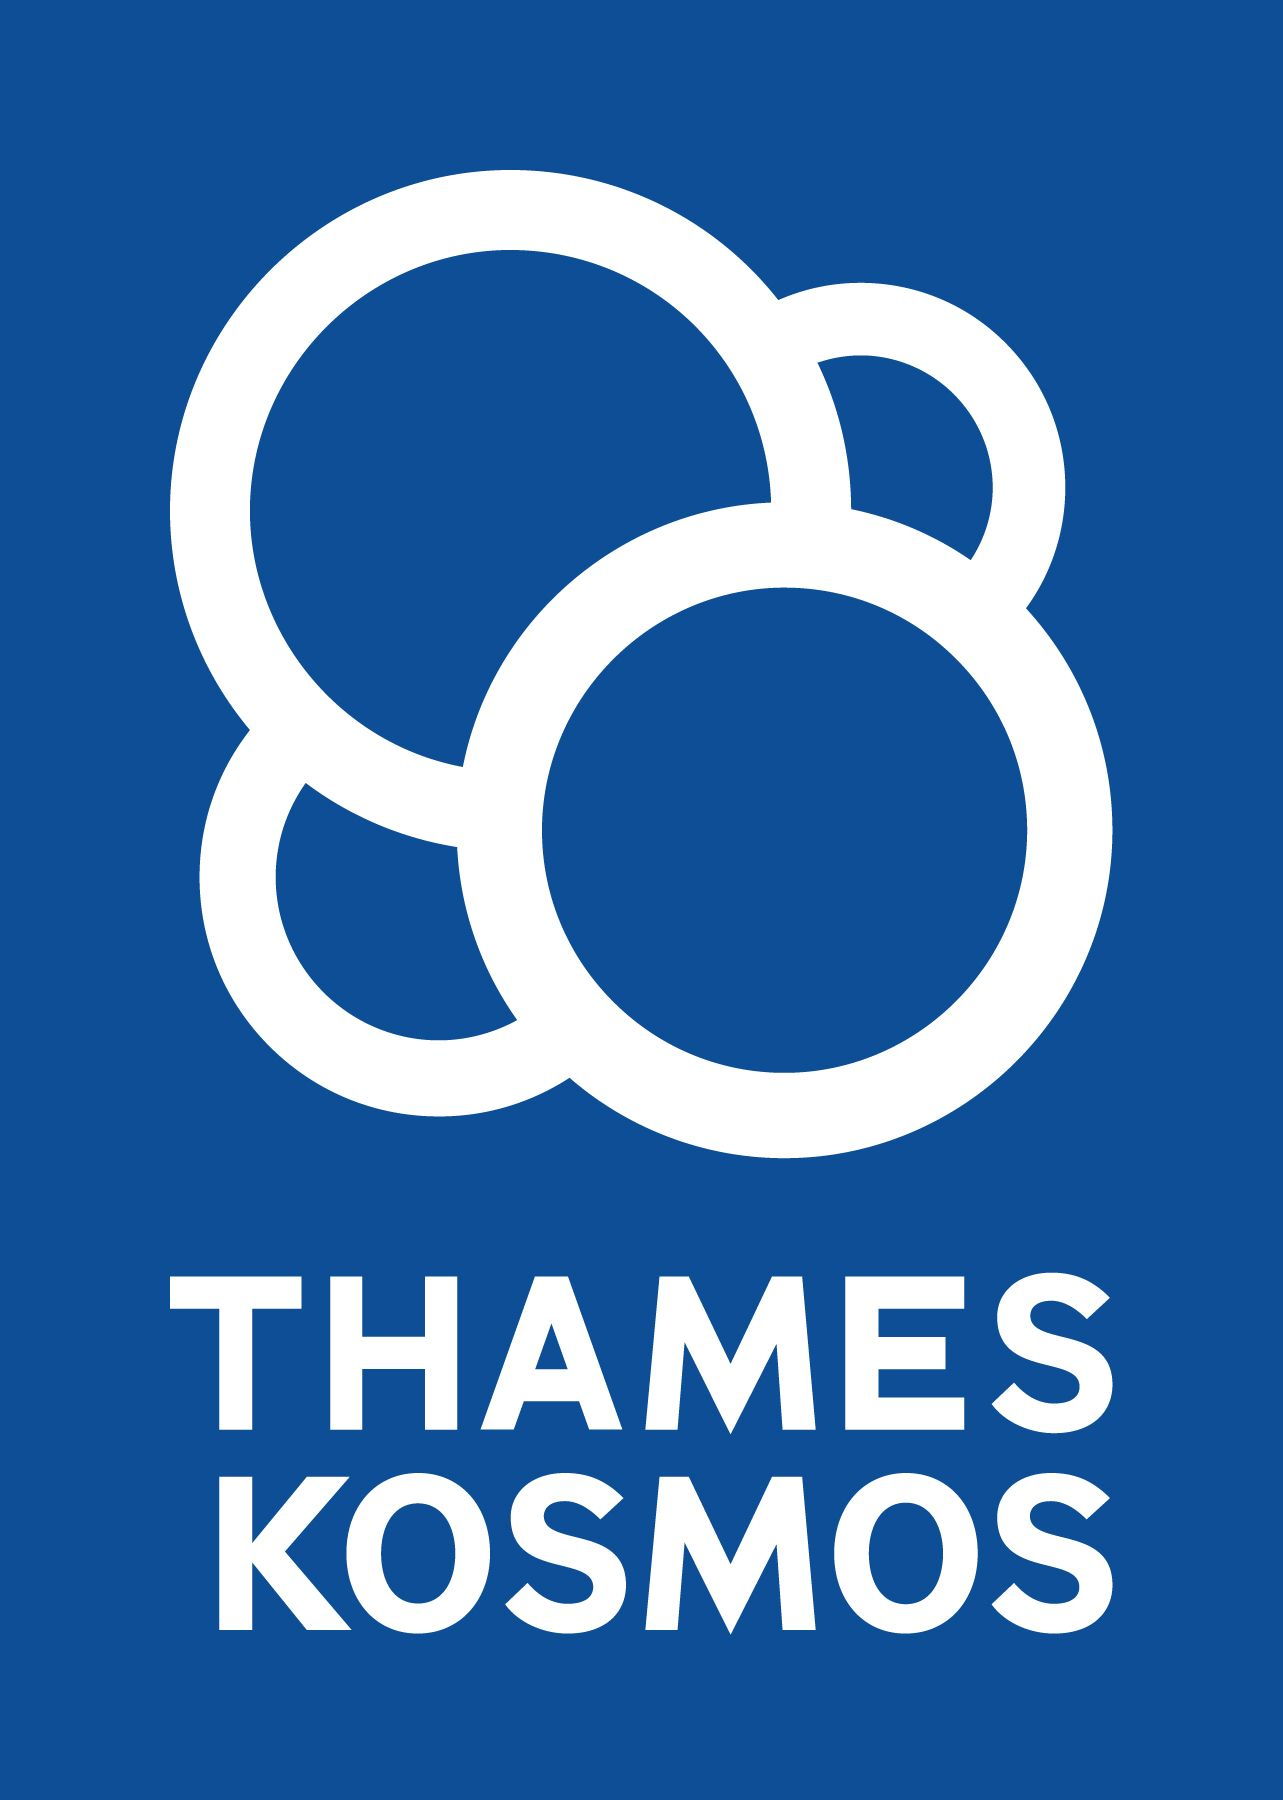 Thames & Kosmos UK Ltd